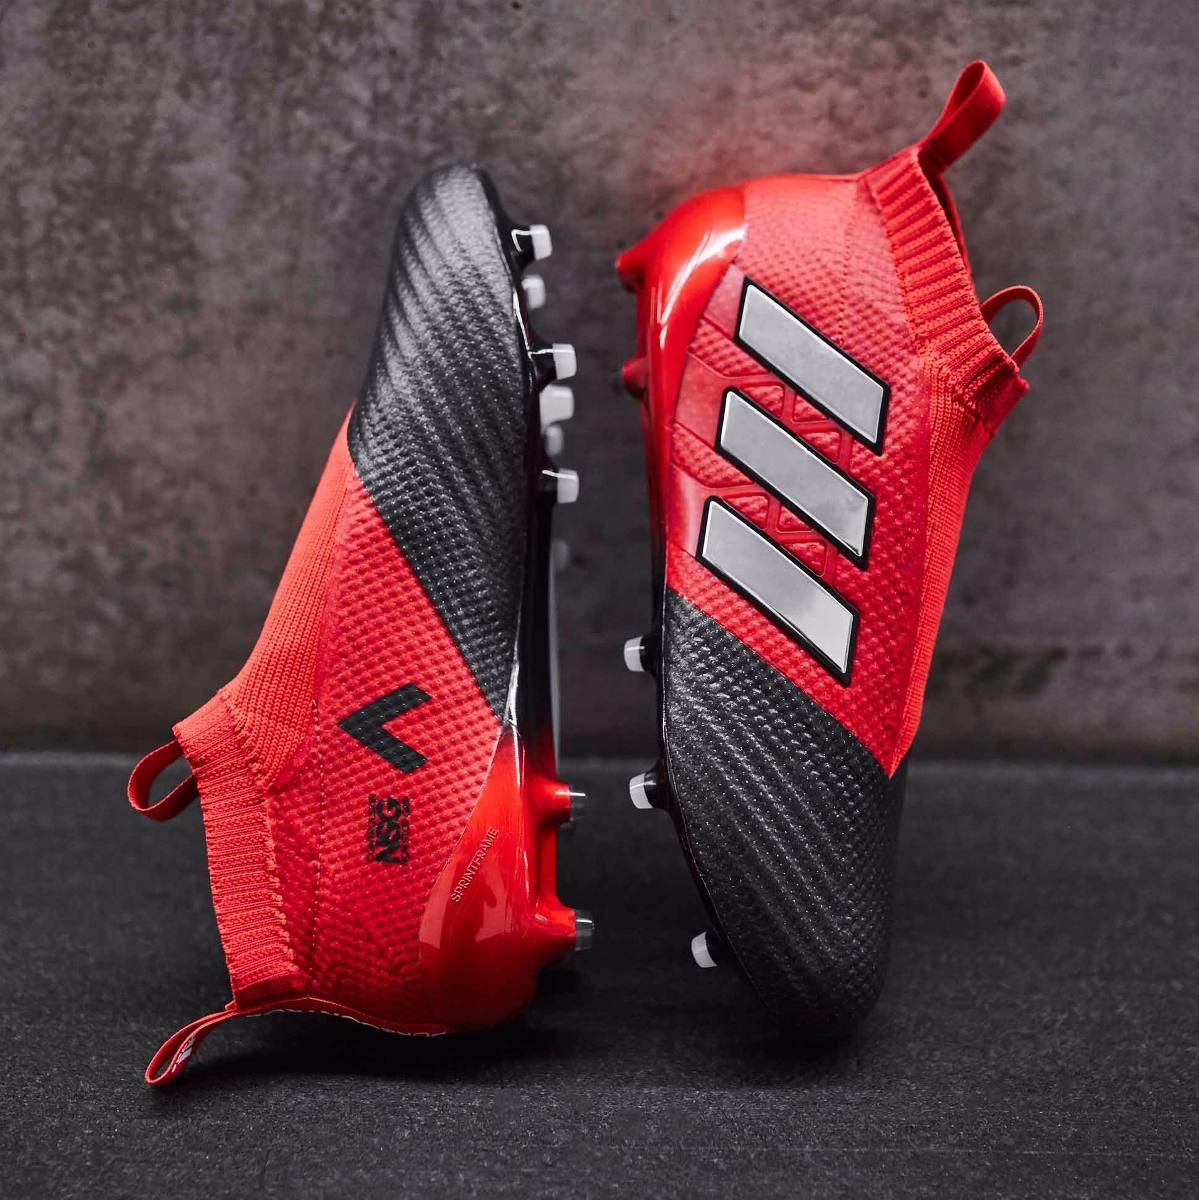 huge selection of fe54c b3f48 Botines adidas Ace 17 Talle 10 Usa Y 11 Usa Rojo Y Negro -   3.300 ...